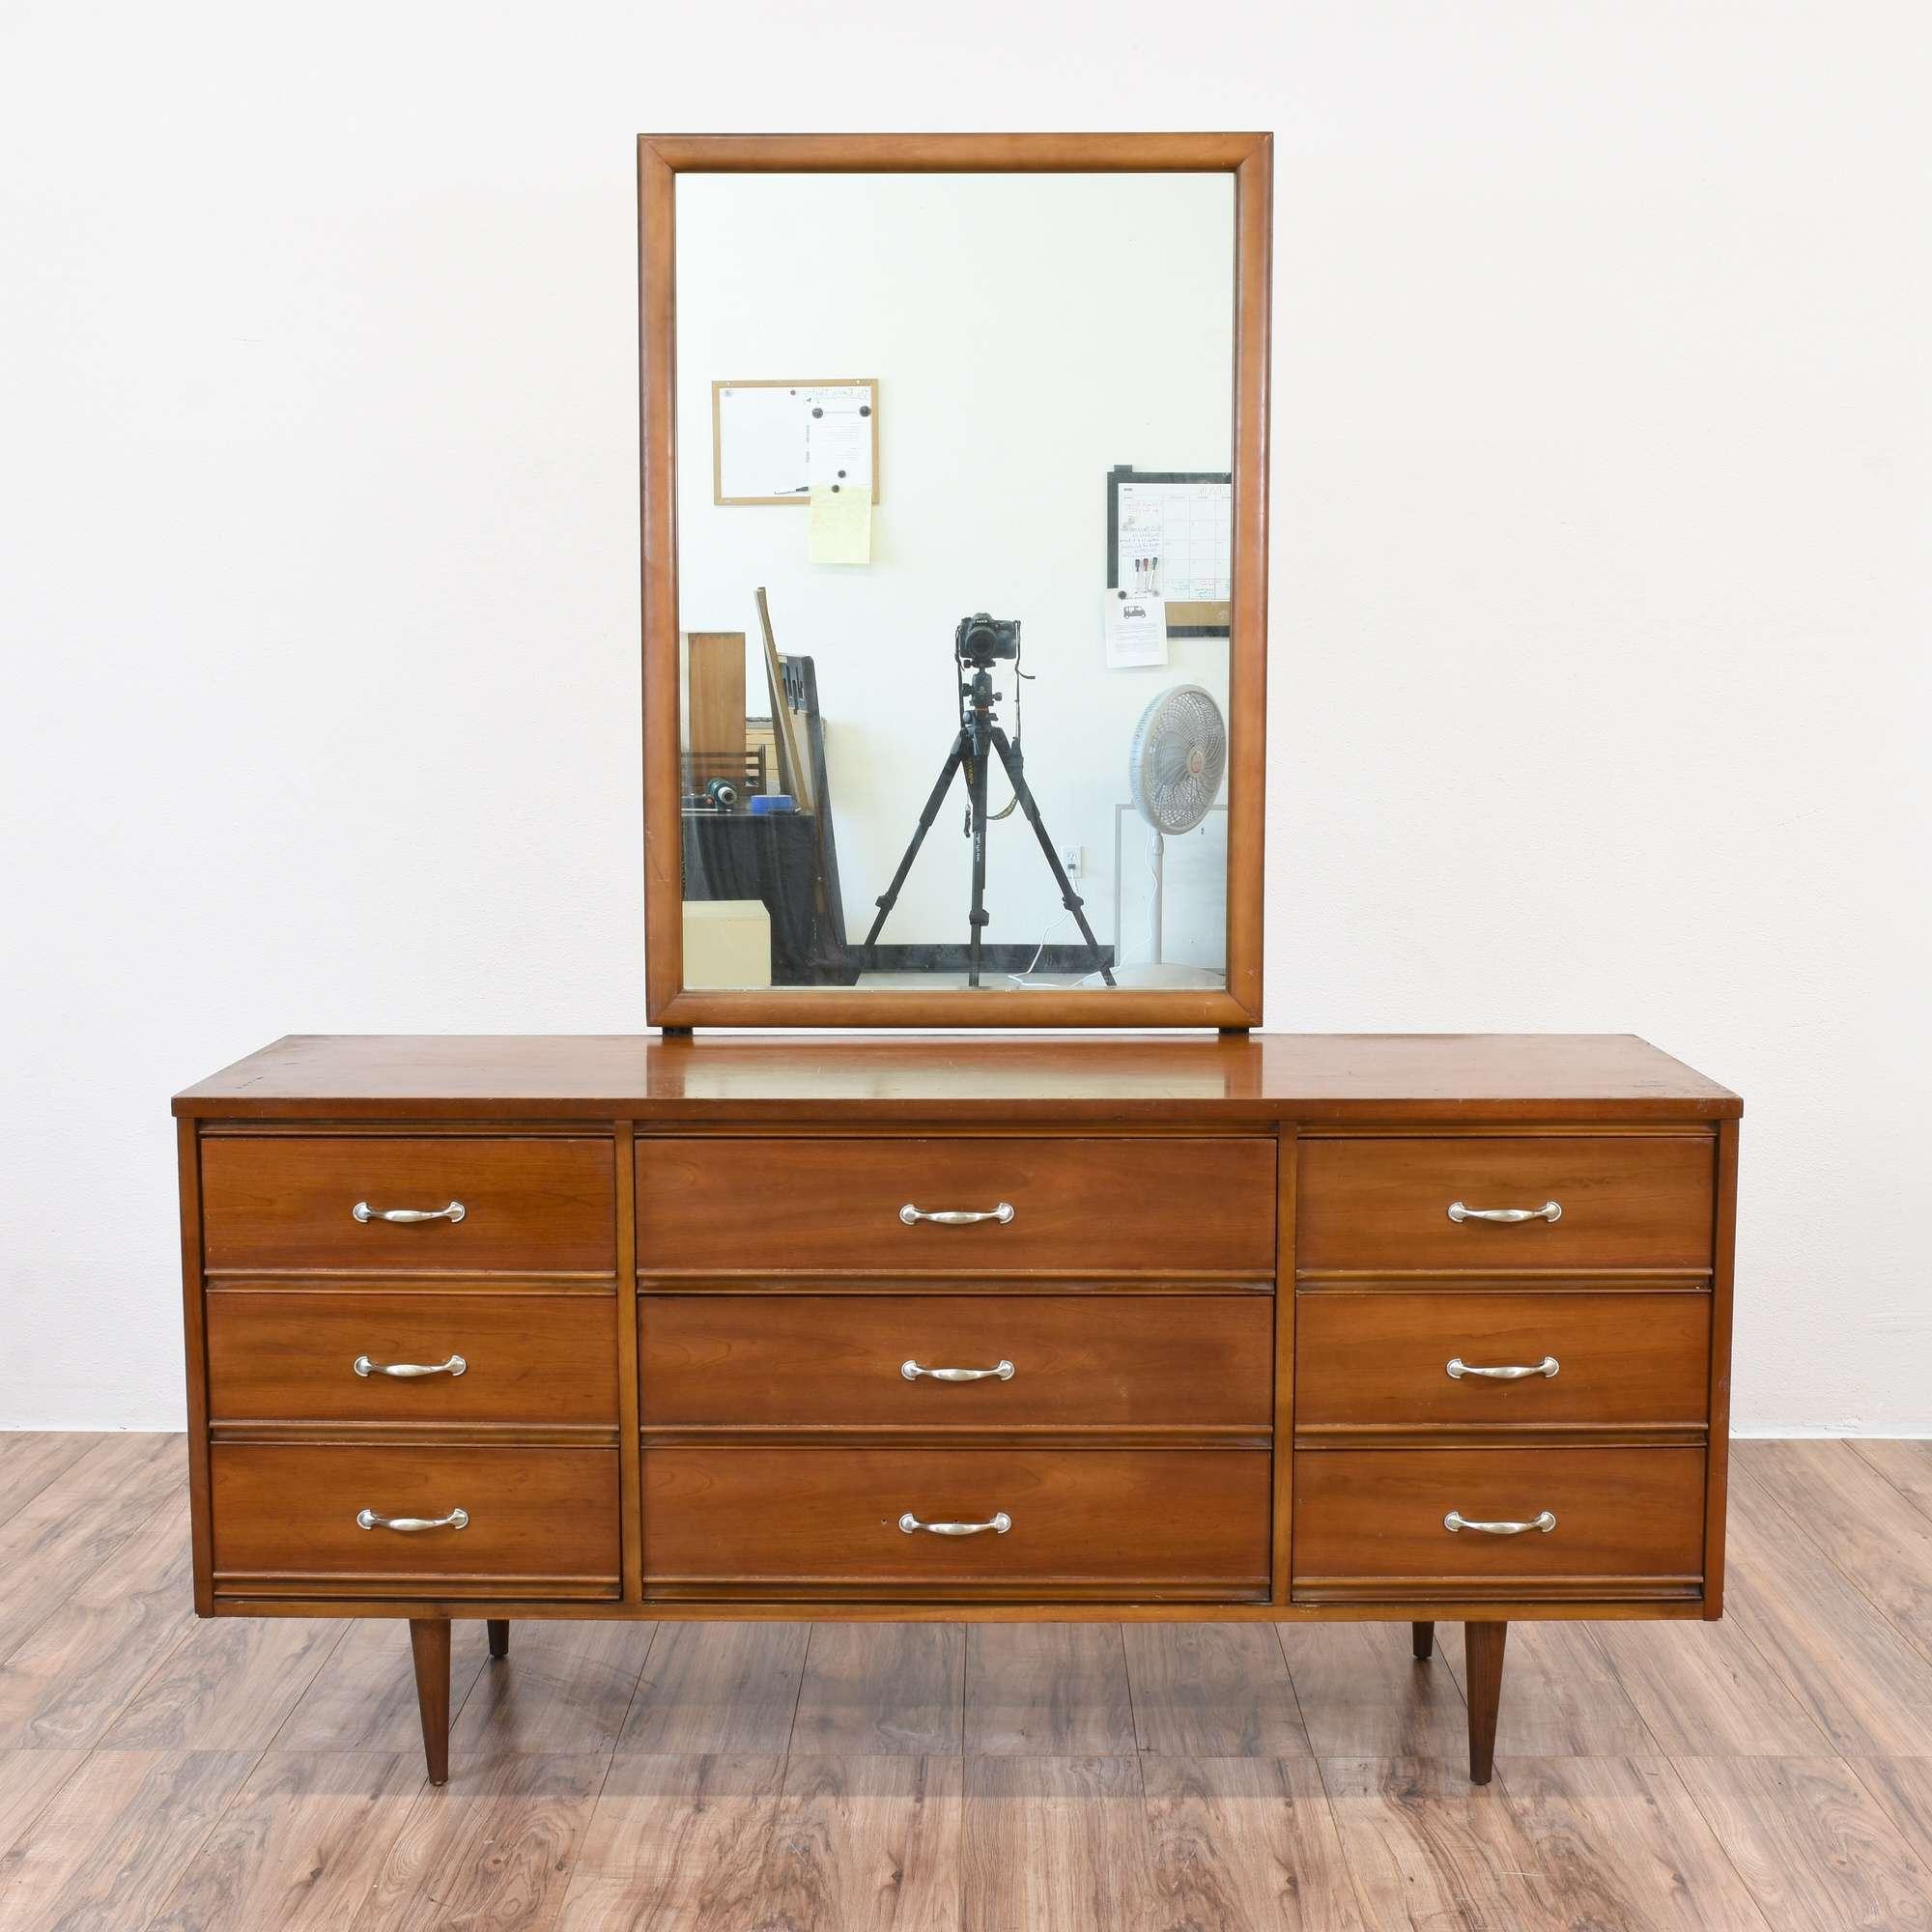 Harmony house mid century modern dresser